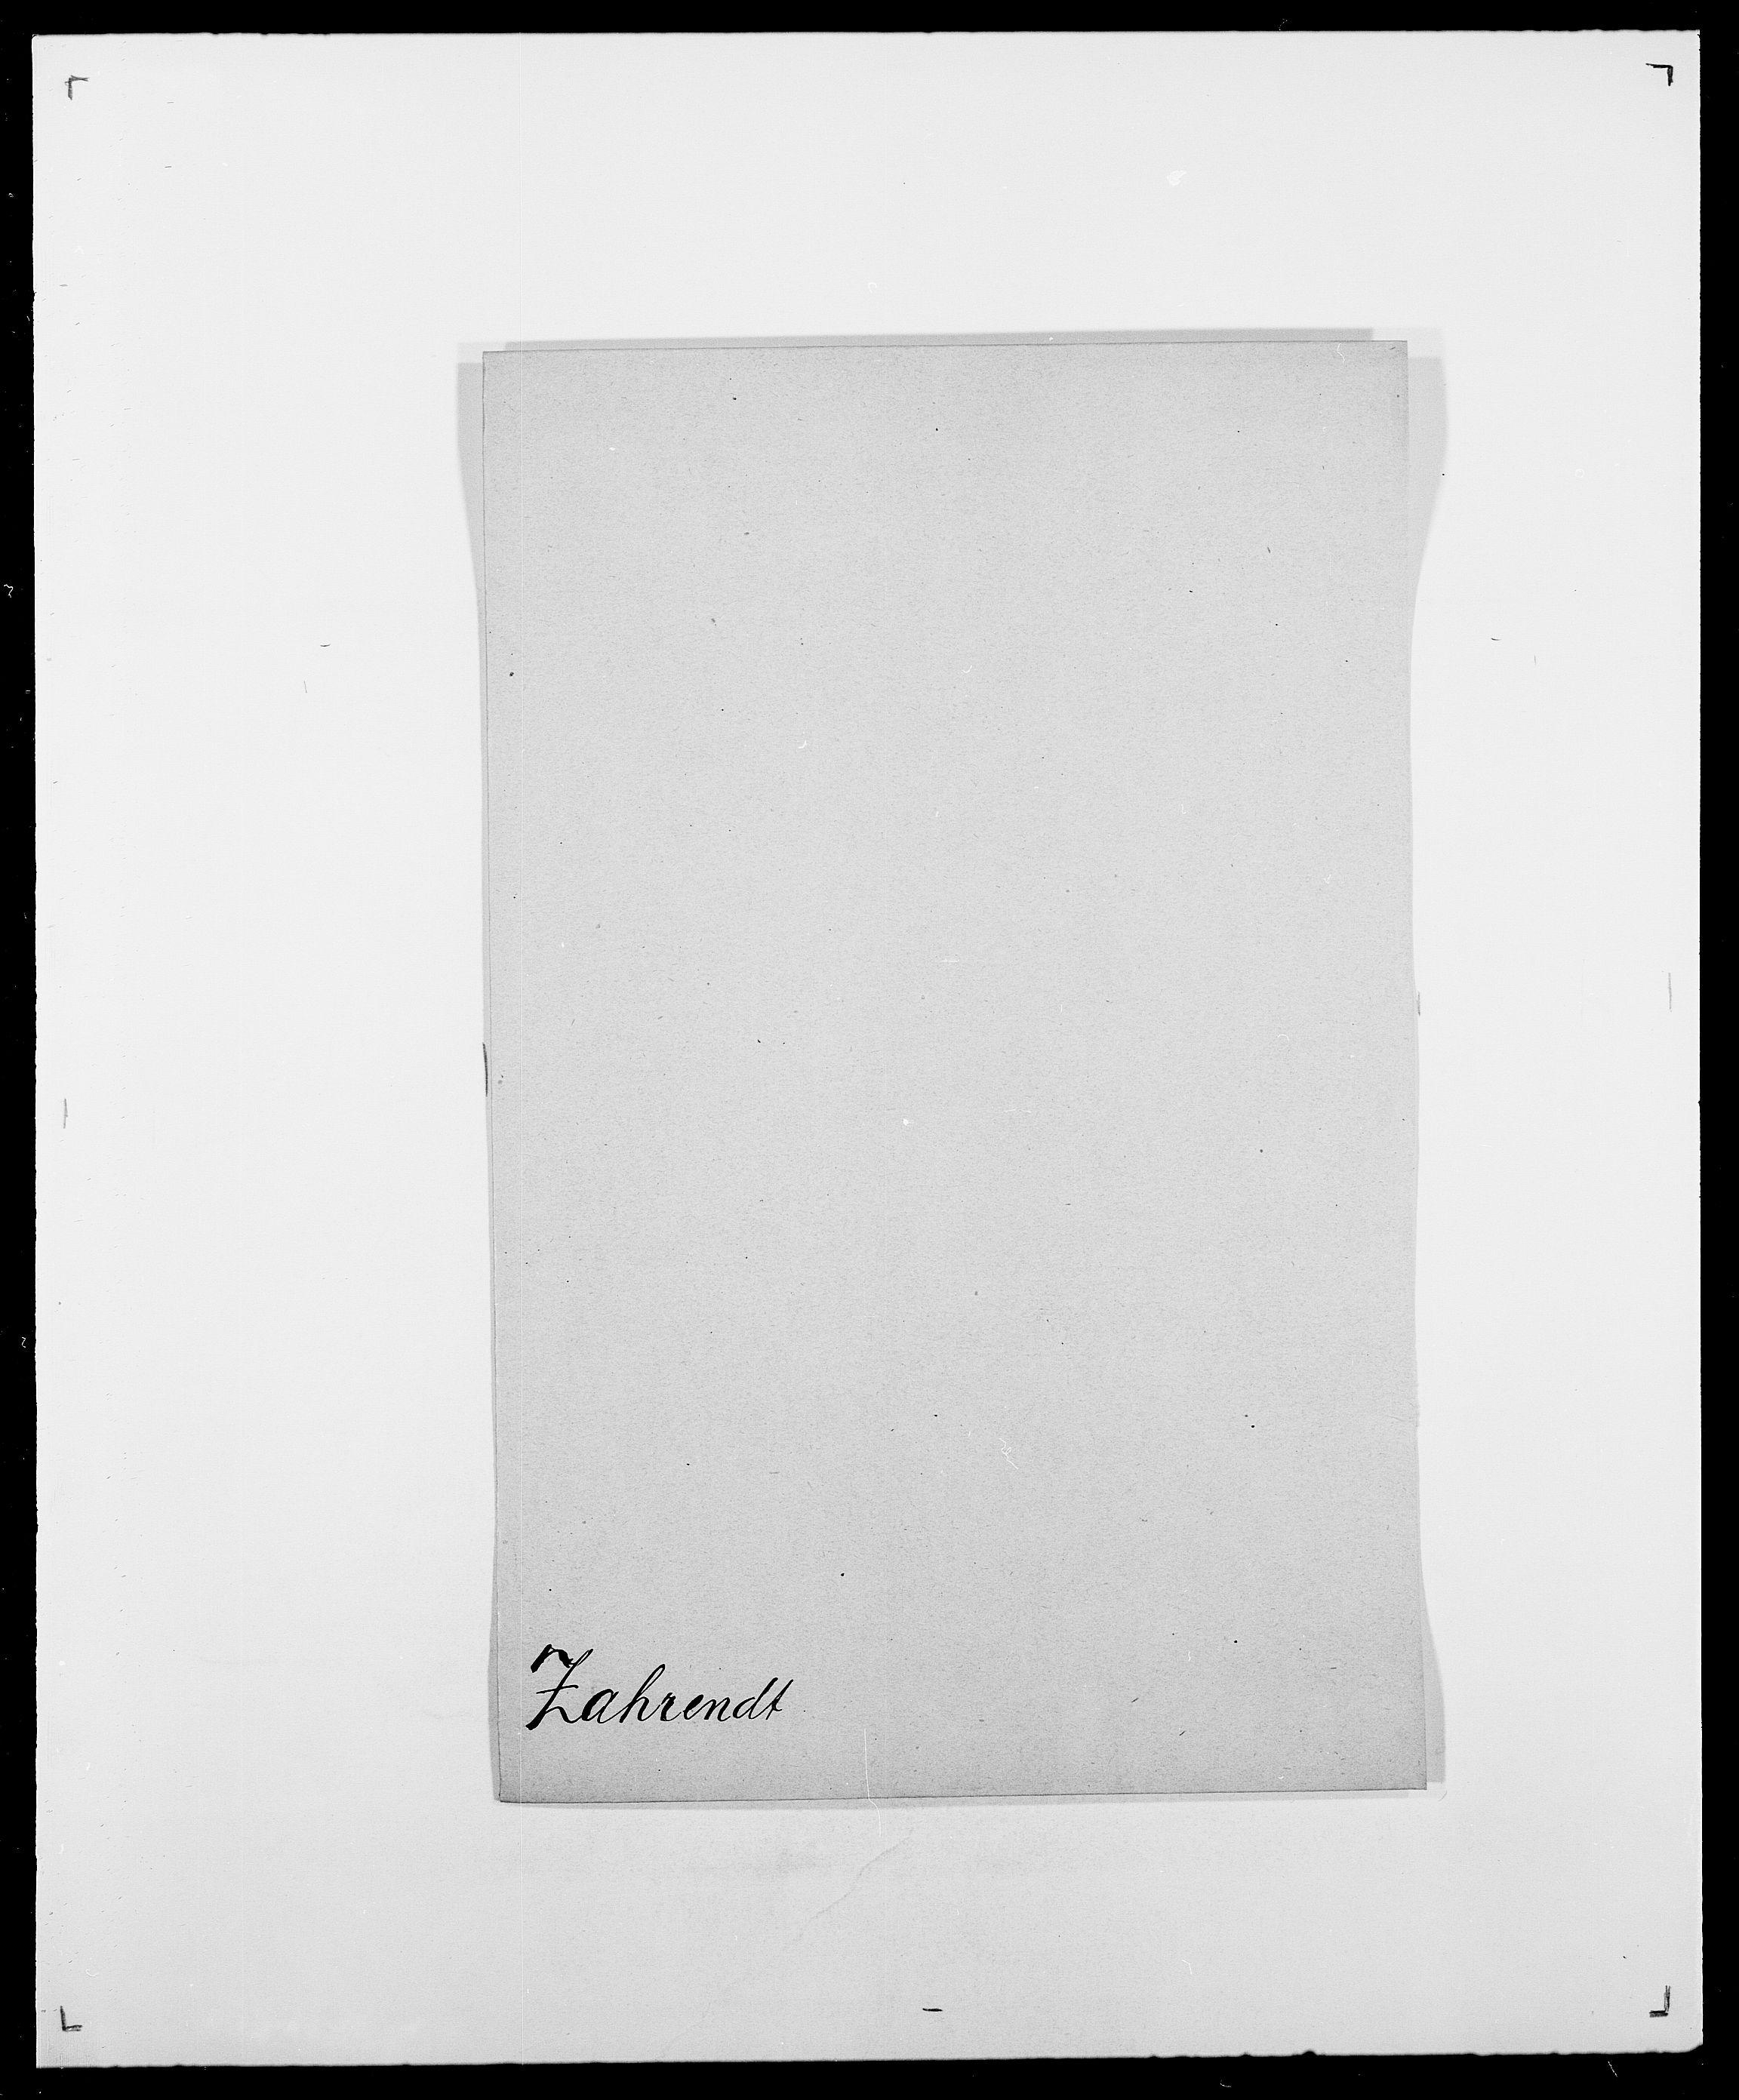 SAO, Delgobe, Charles Antoine - samling, D/Da/L0043: Wulfsberg - v. Zanten, s. 86